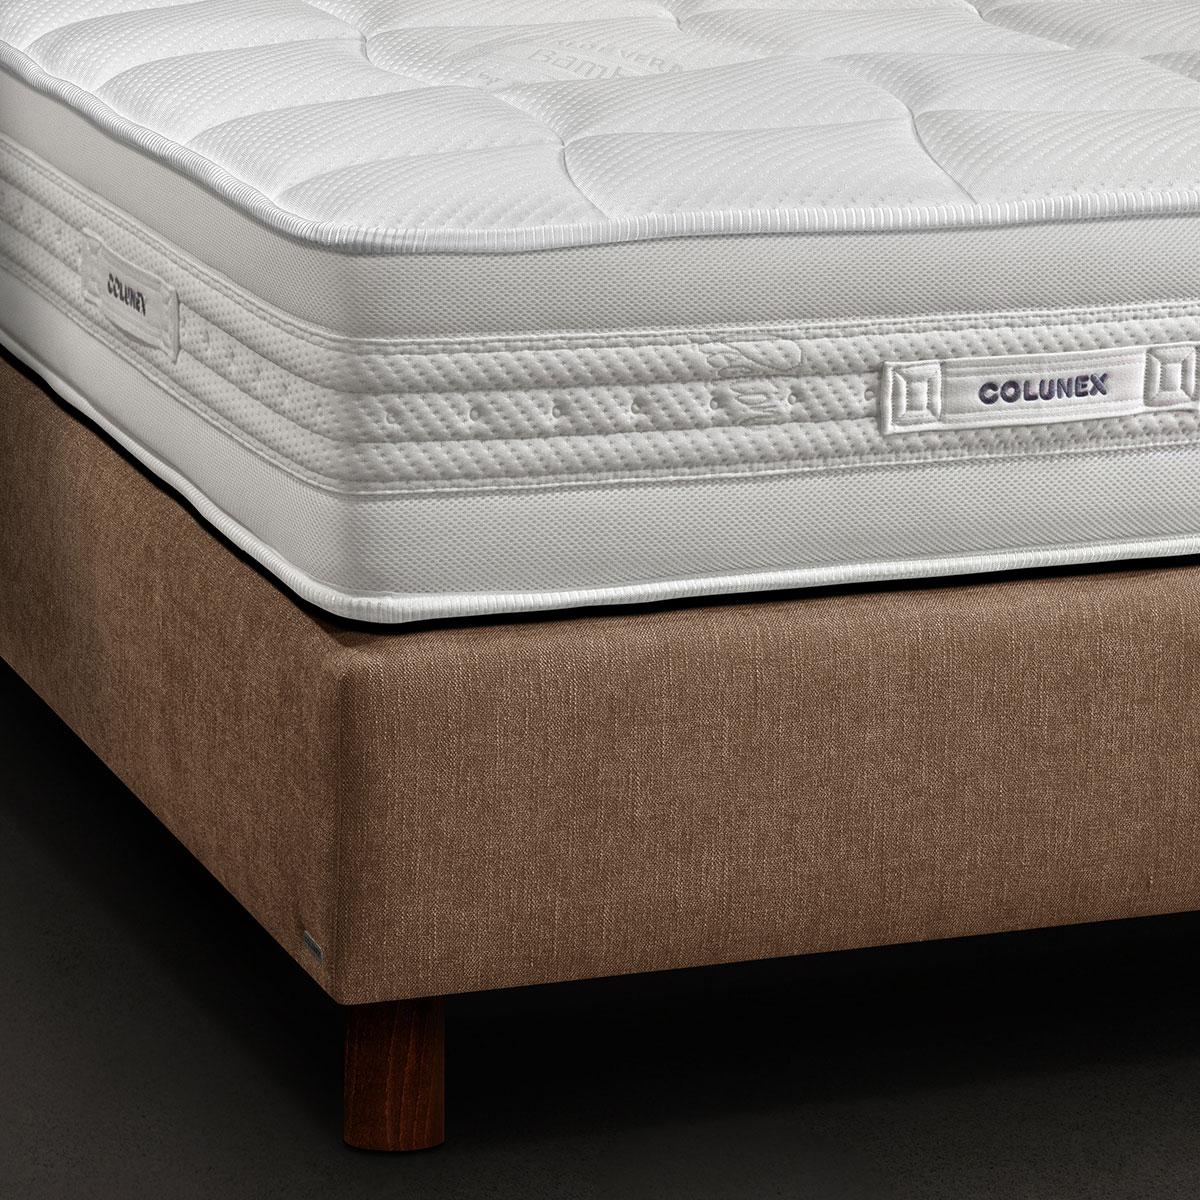 new start plus Matela New Start Plus colunex new start plus mattress 01 1